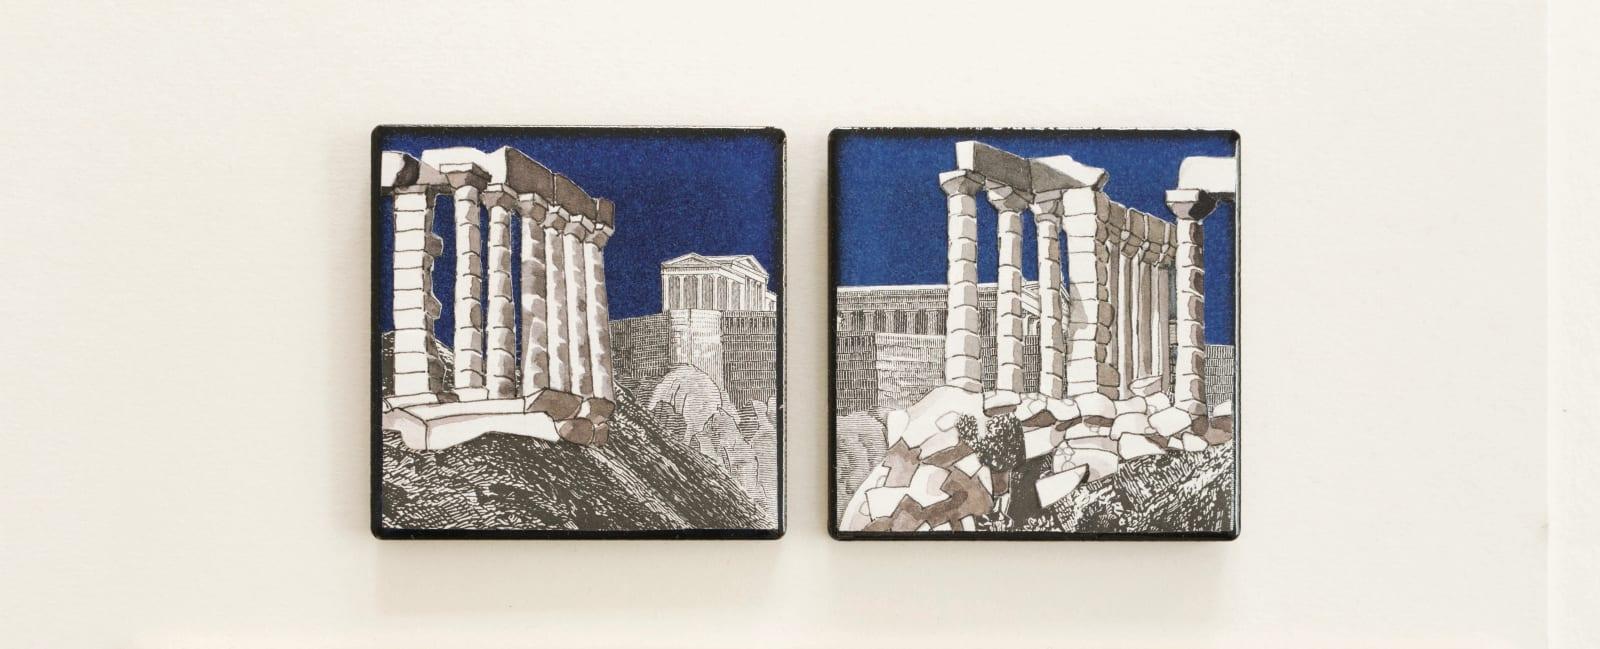 Anne Desmet, Dreams of Greece, 2019